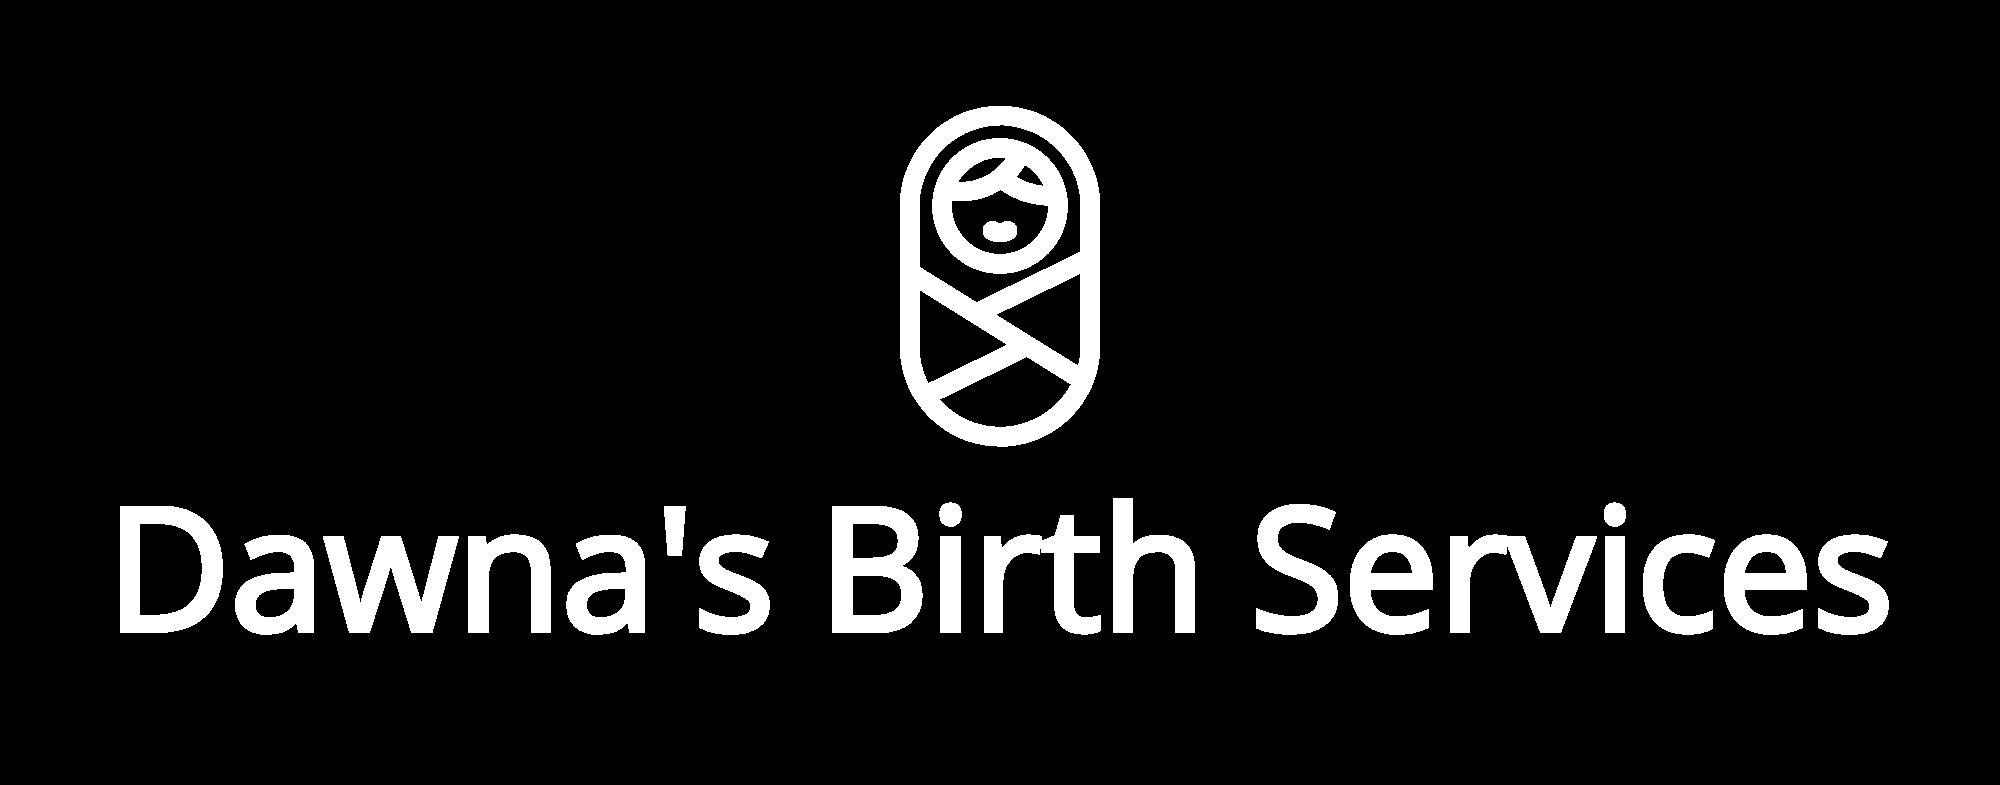 Dawna_s Birth Services-logo-white.png